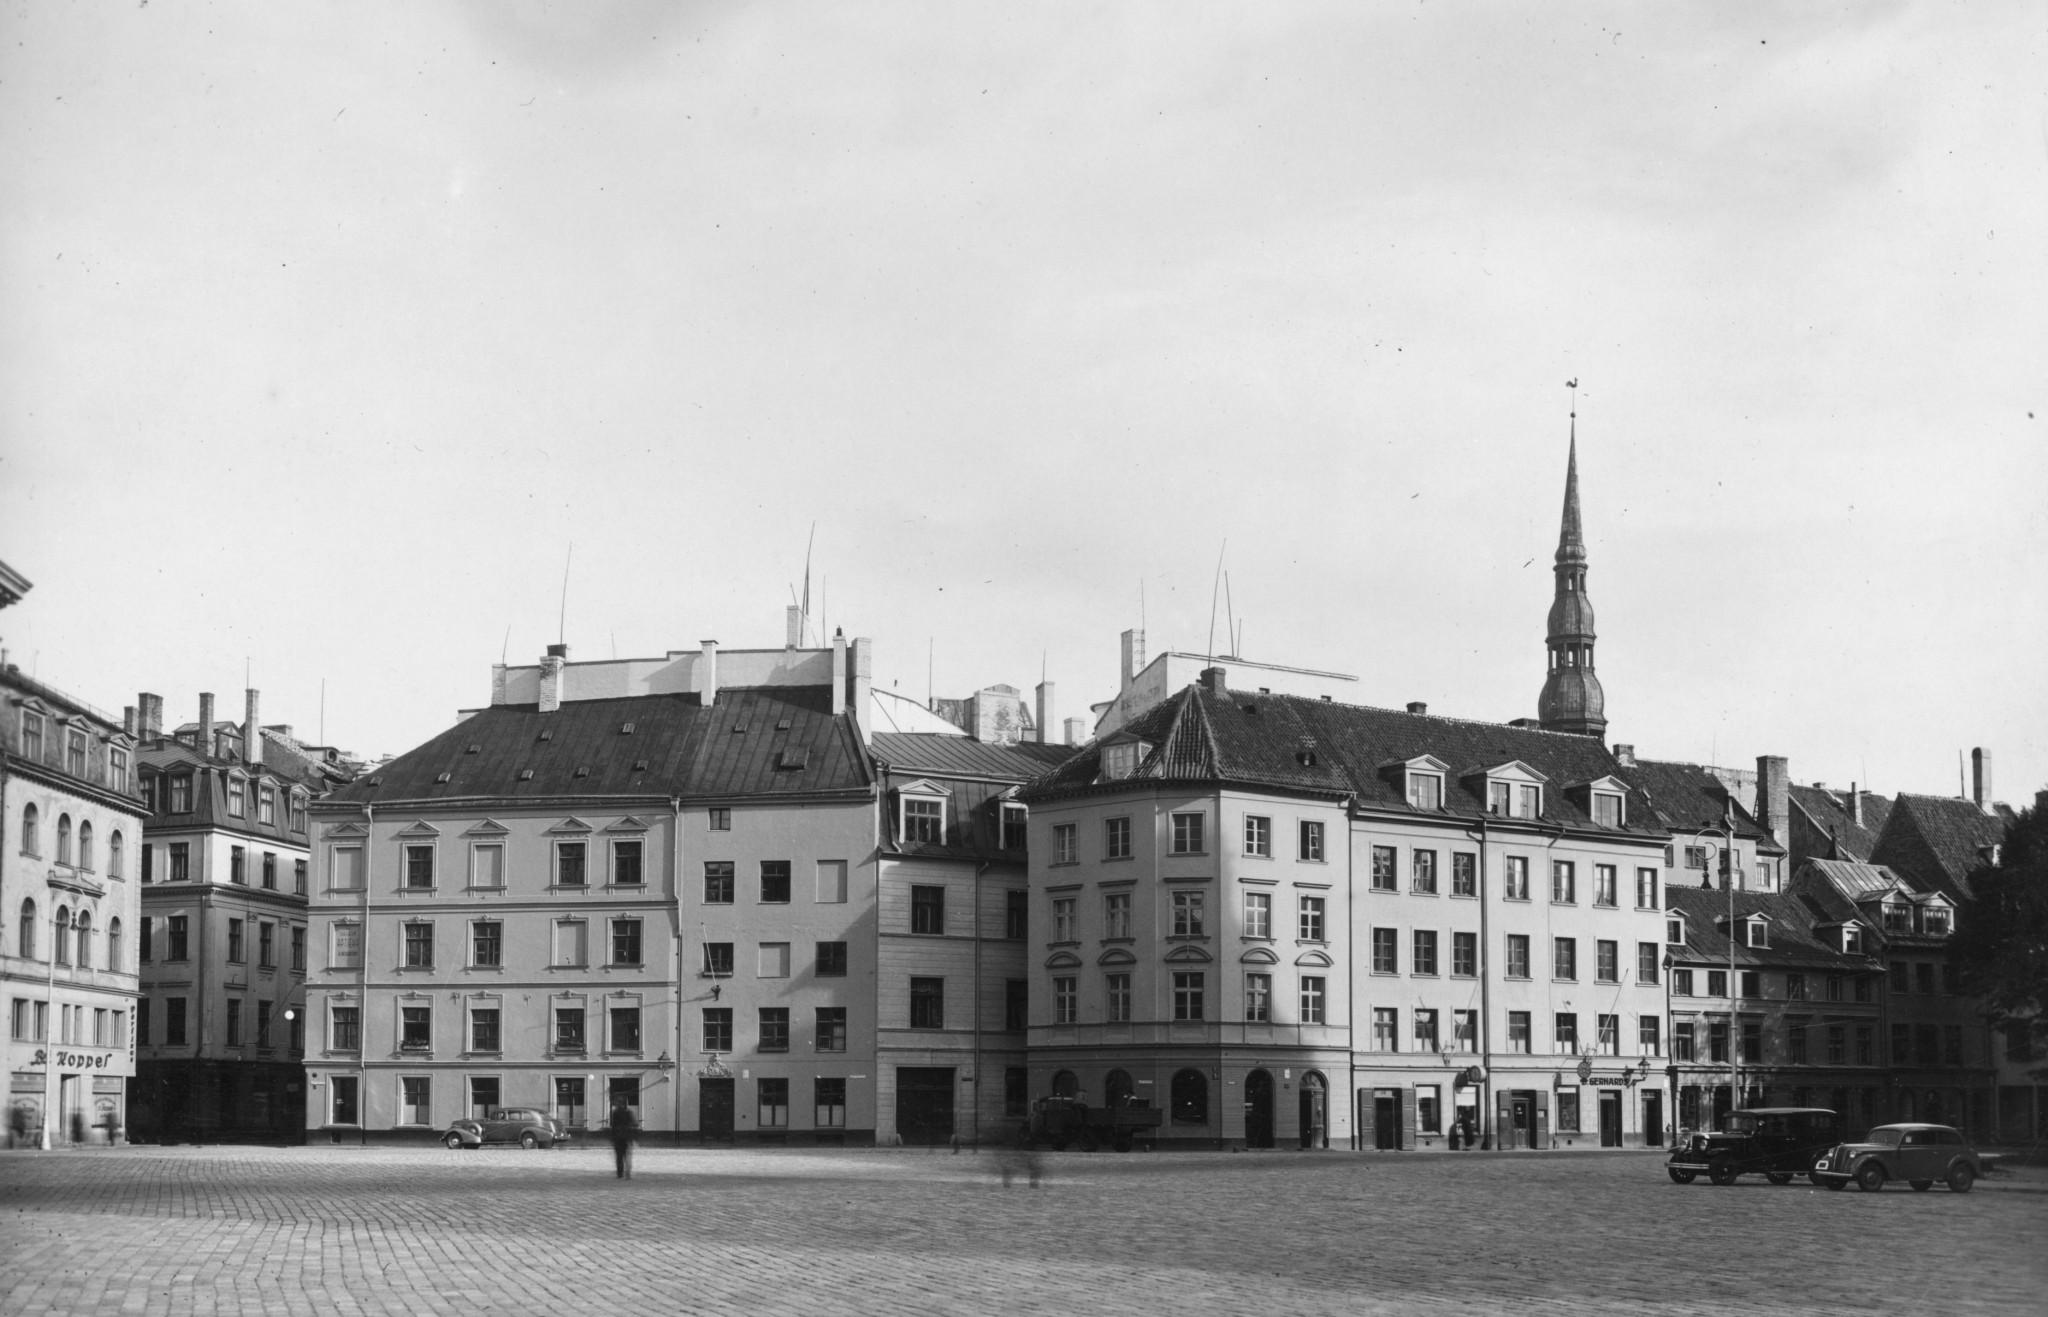 Riga, capital of Latvia. © Ed Kraucs/Hulton Archive/Getty Images